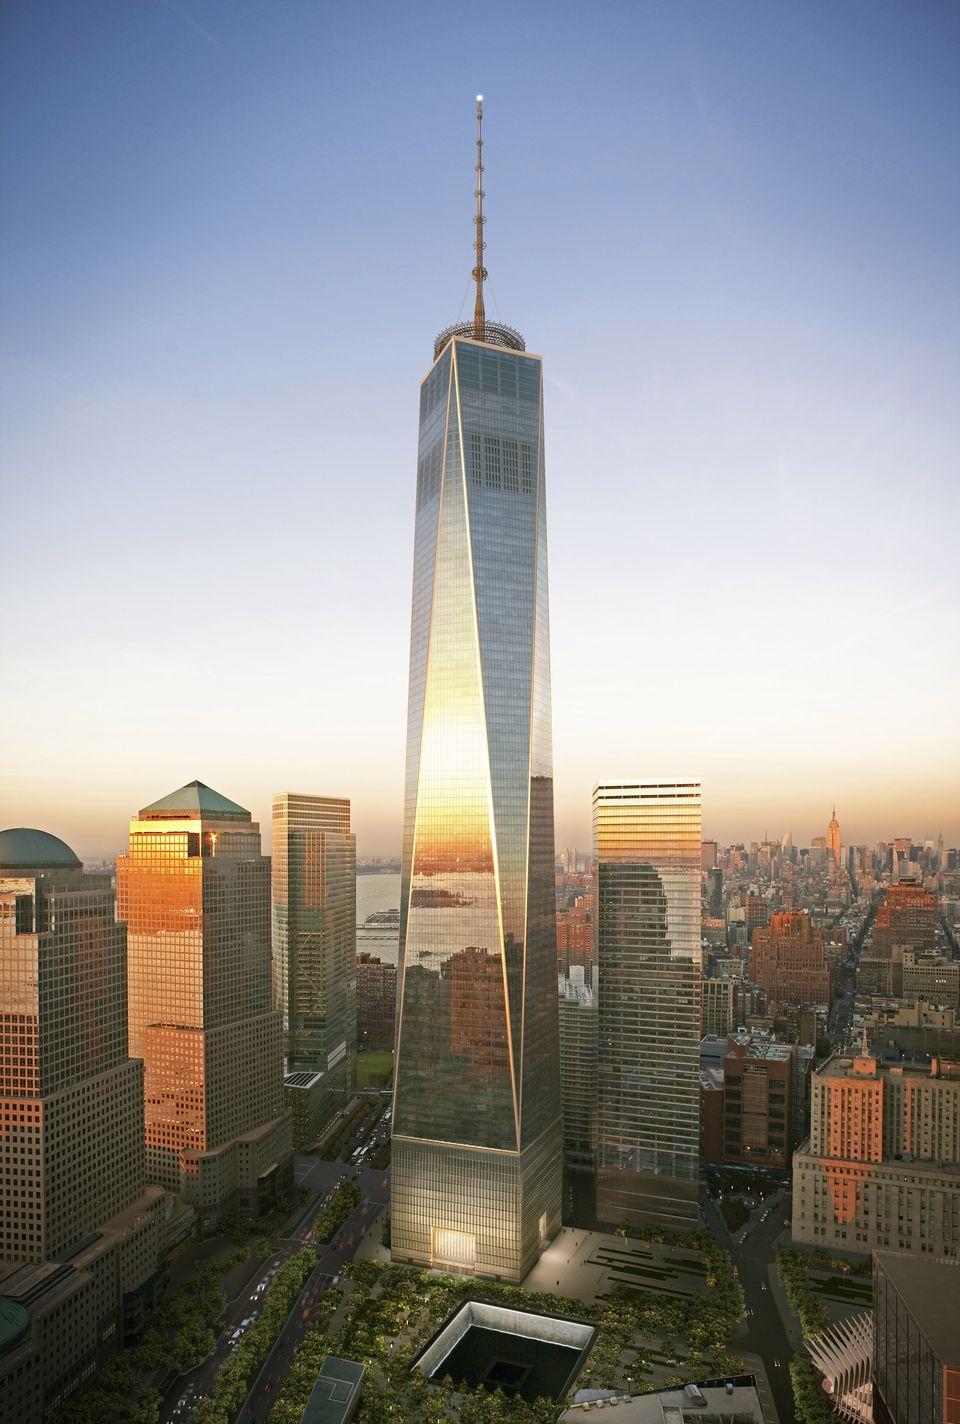 Freedom Tower World Trade Center. Skidmore, Owings U0026 Merrill/ Daniel  Libeskind, David Childs. Height: 541 M